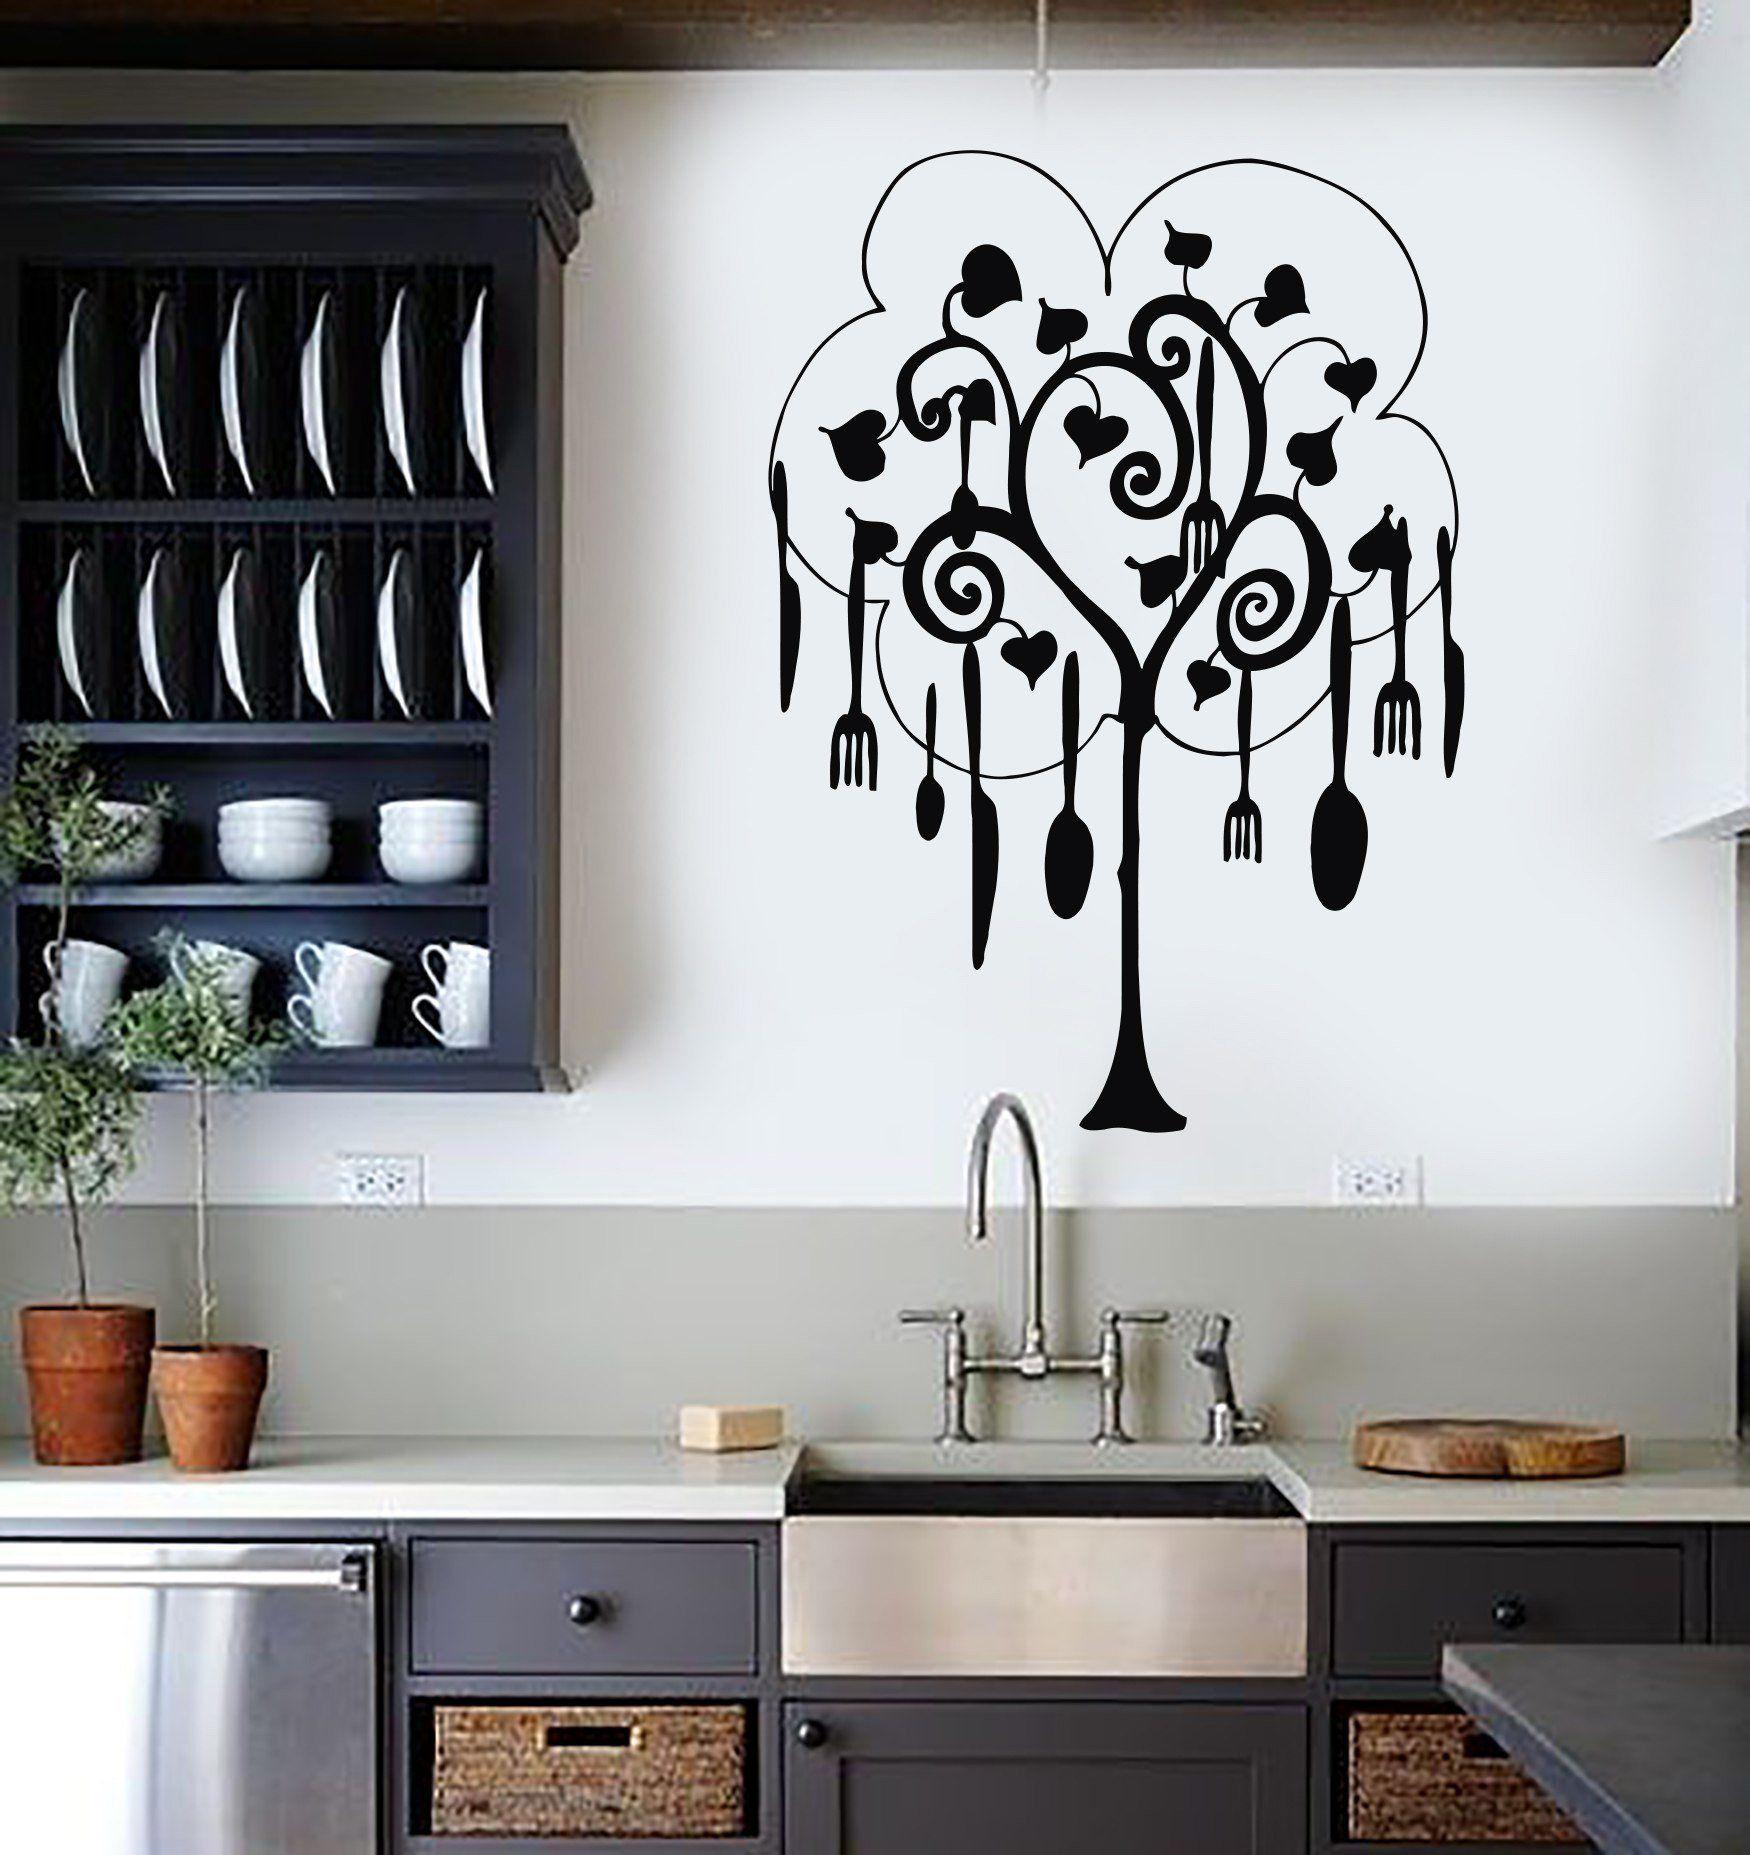 Vinyl Wall Decal Tree Cutlery Kitchen Restaurant Housewife Art ...